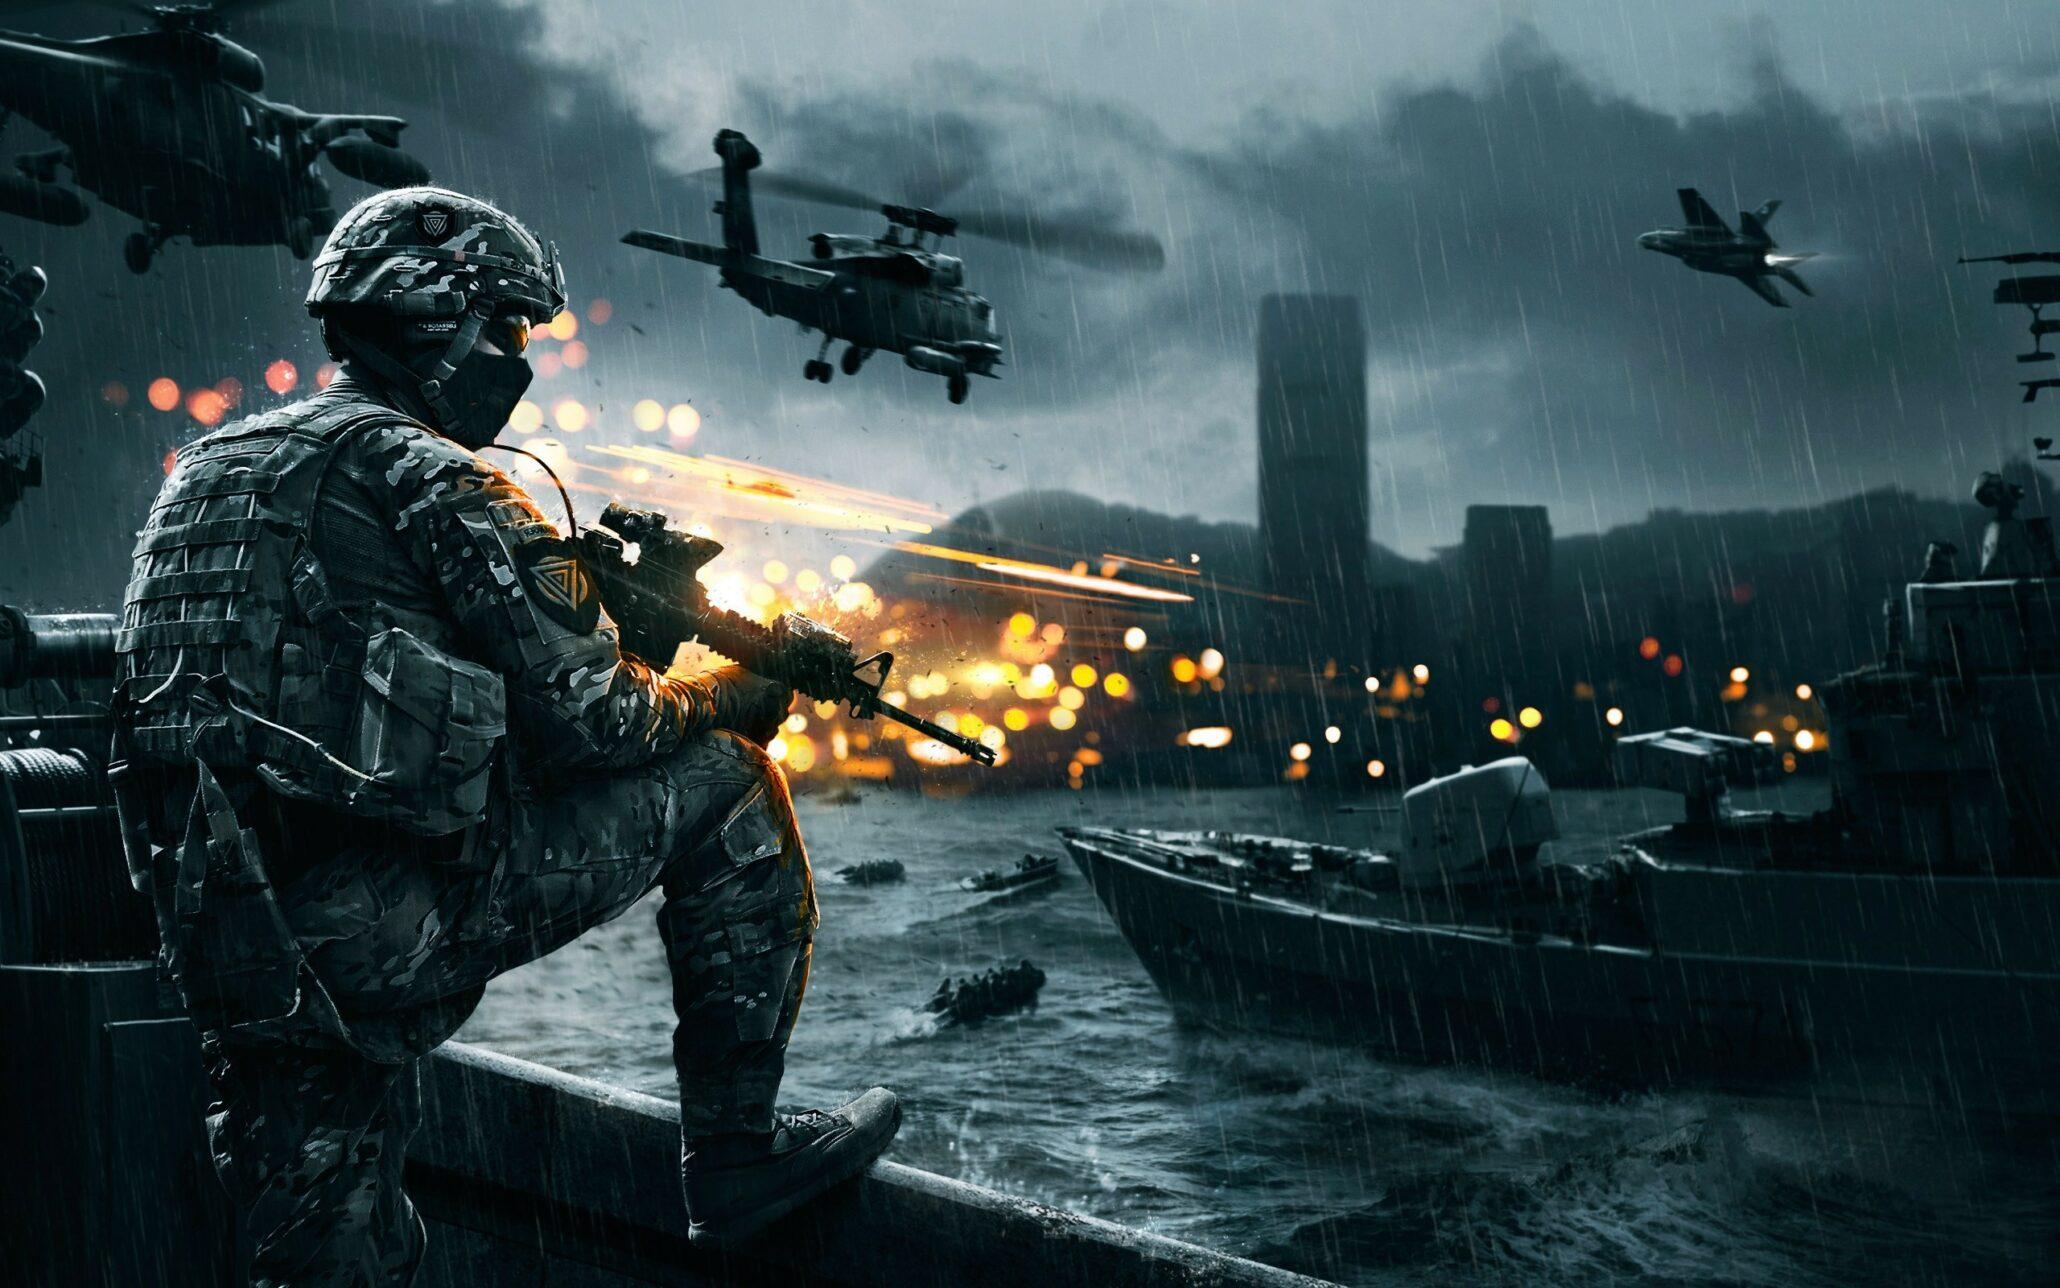 Pubg Hd Background Battle Field: Battlefield 1, Battlefield 4, Hardline Are All Getting A